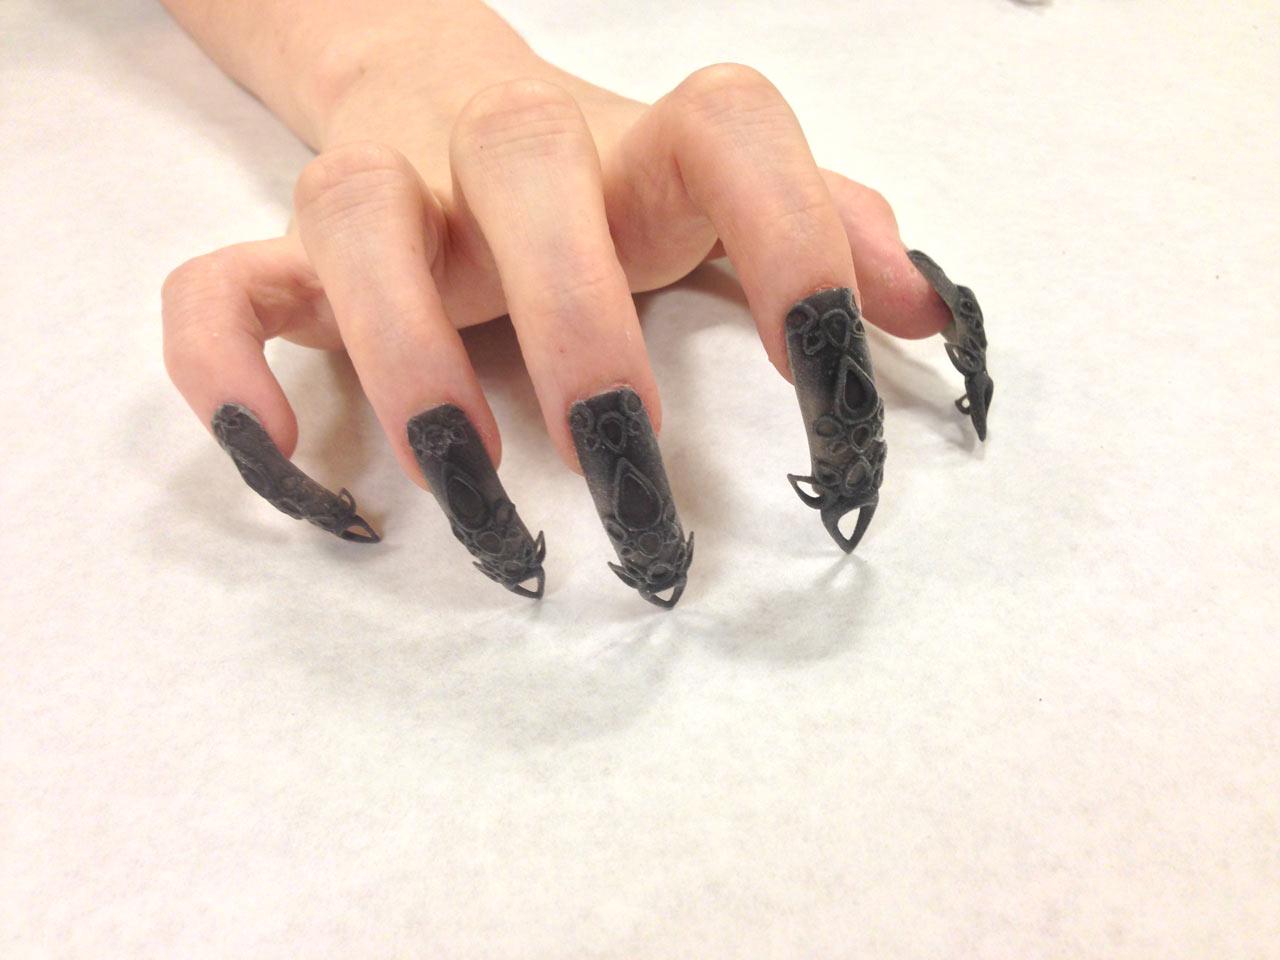 TheLaserGirls-3D-Printed-Nails-7-Black-Castle